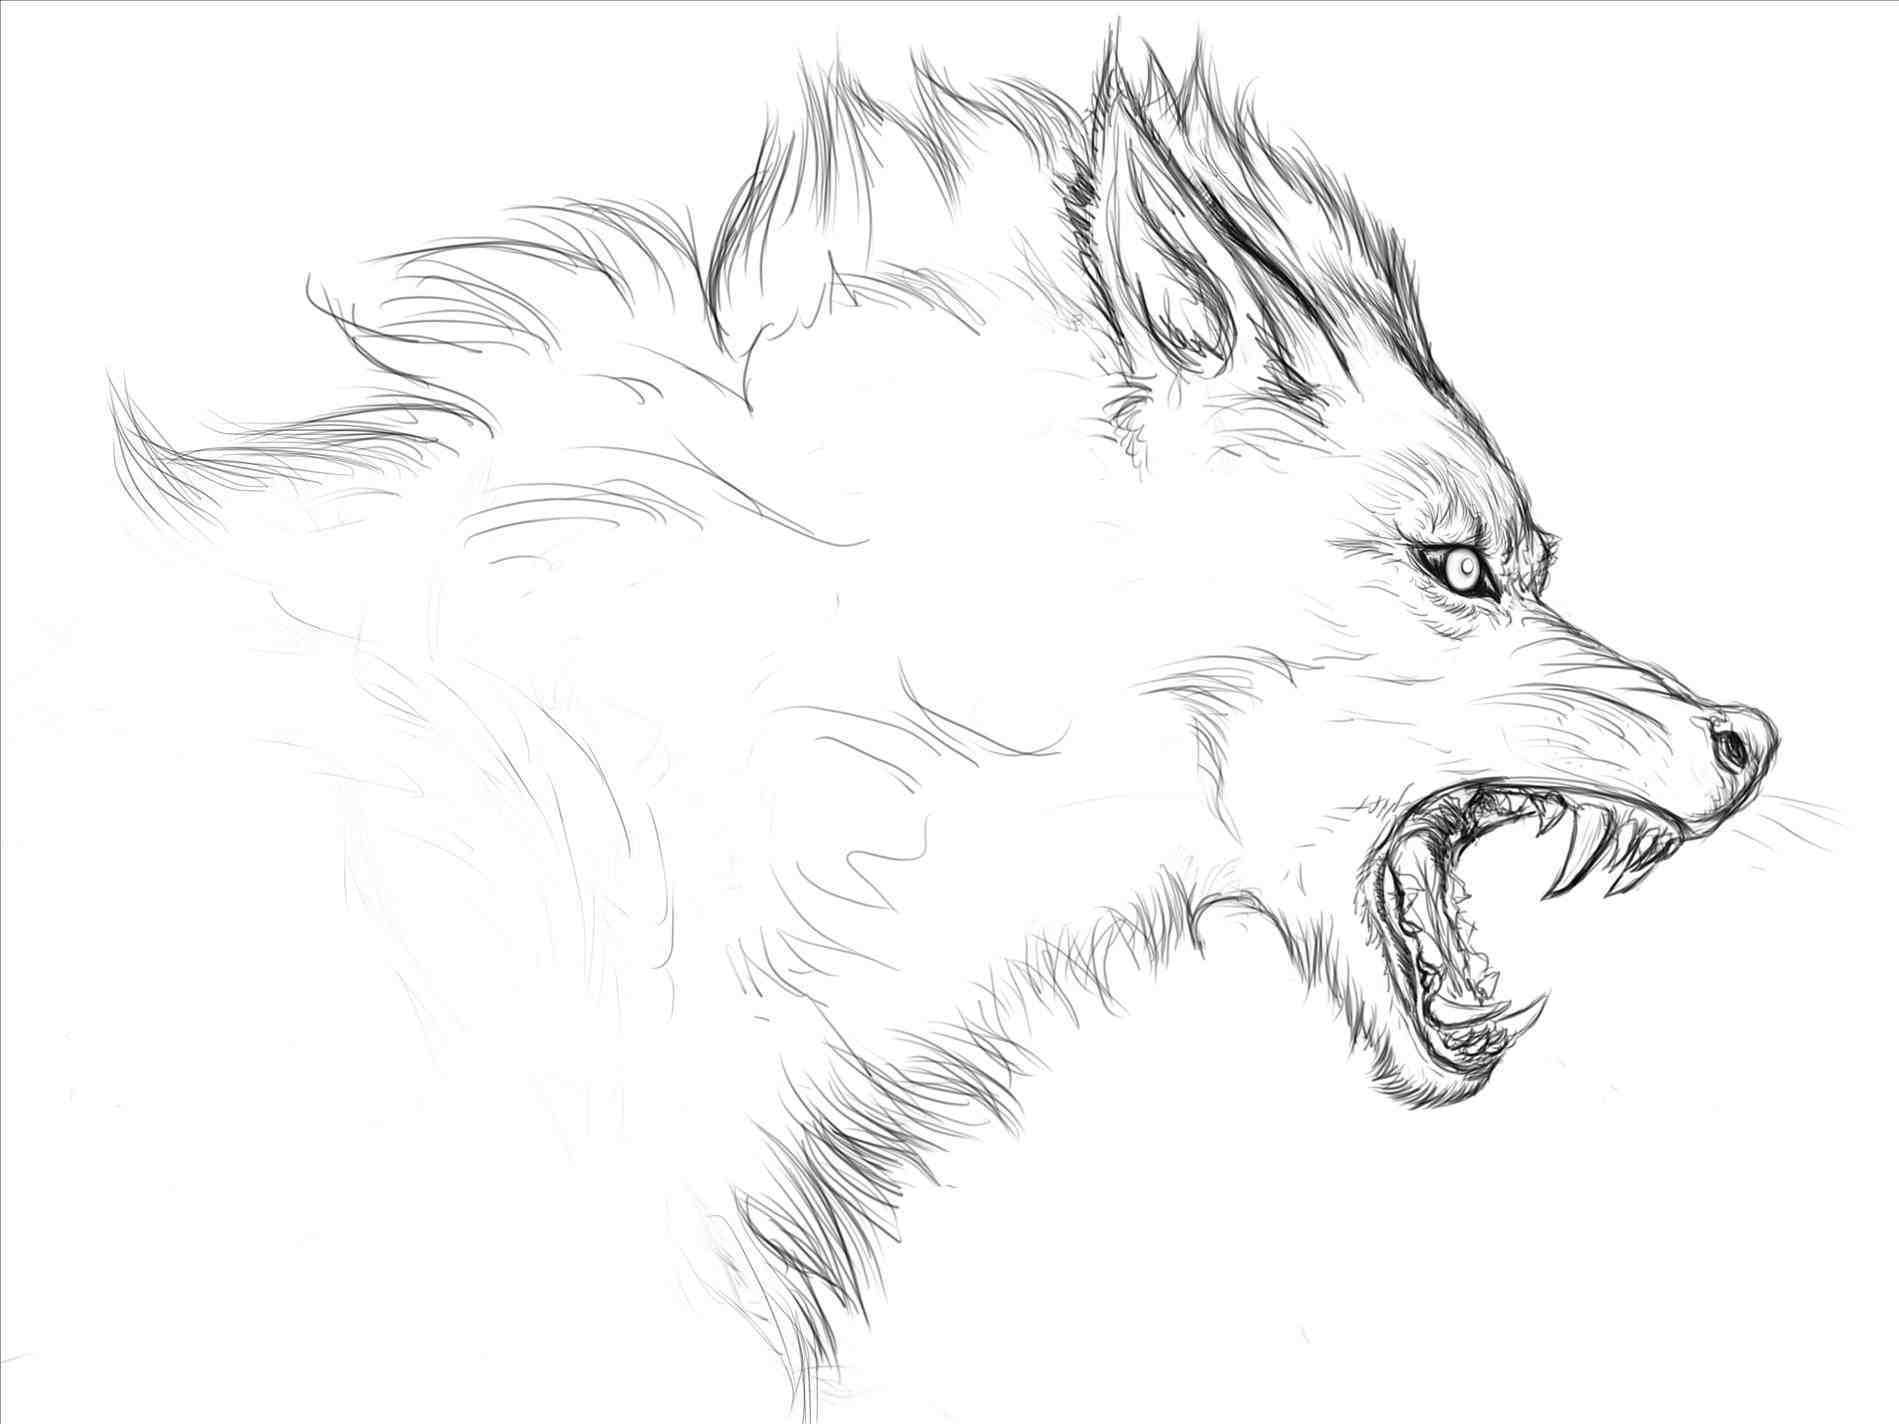 Картинка волка нарисованная